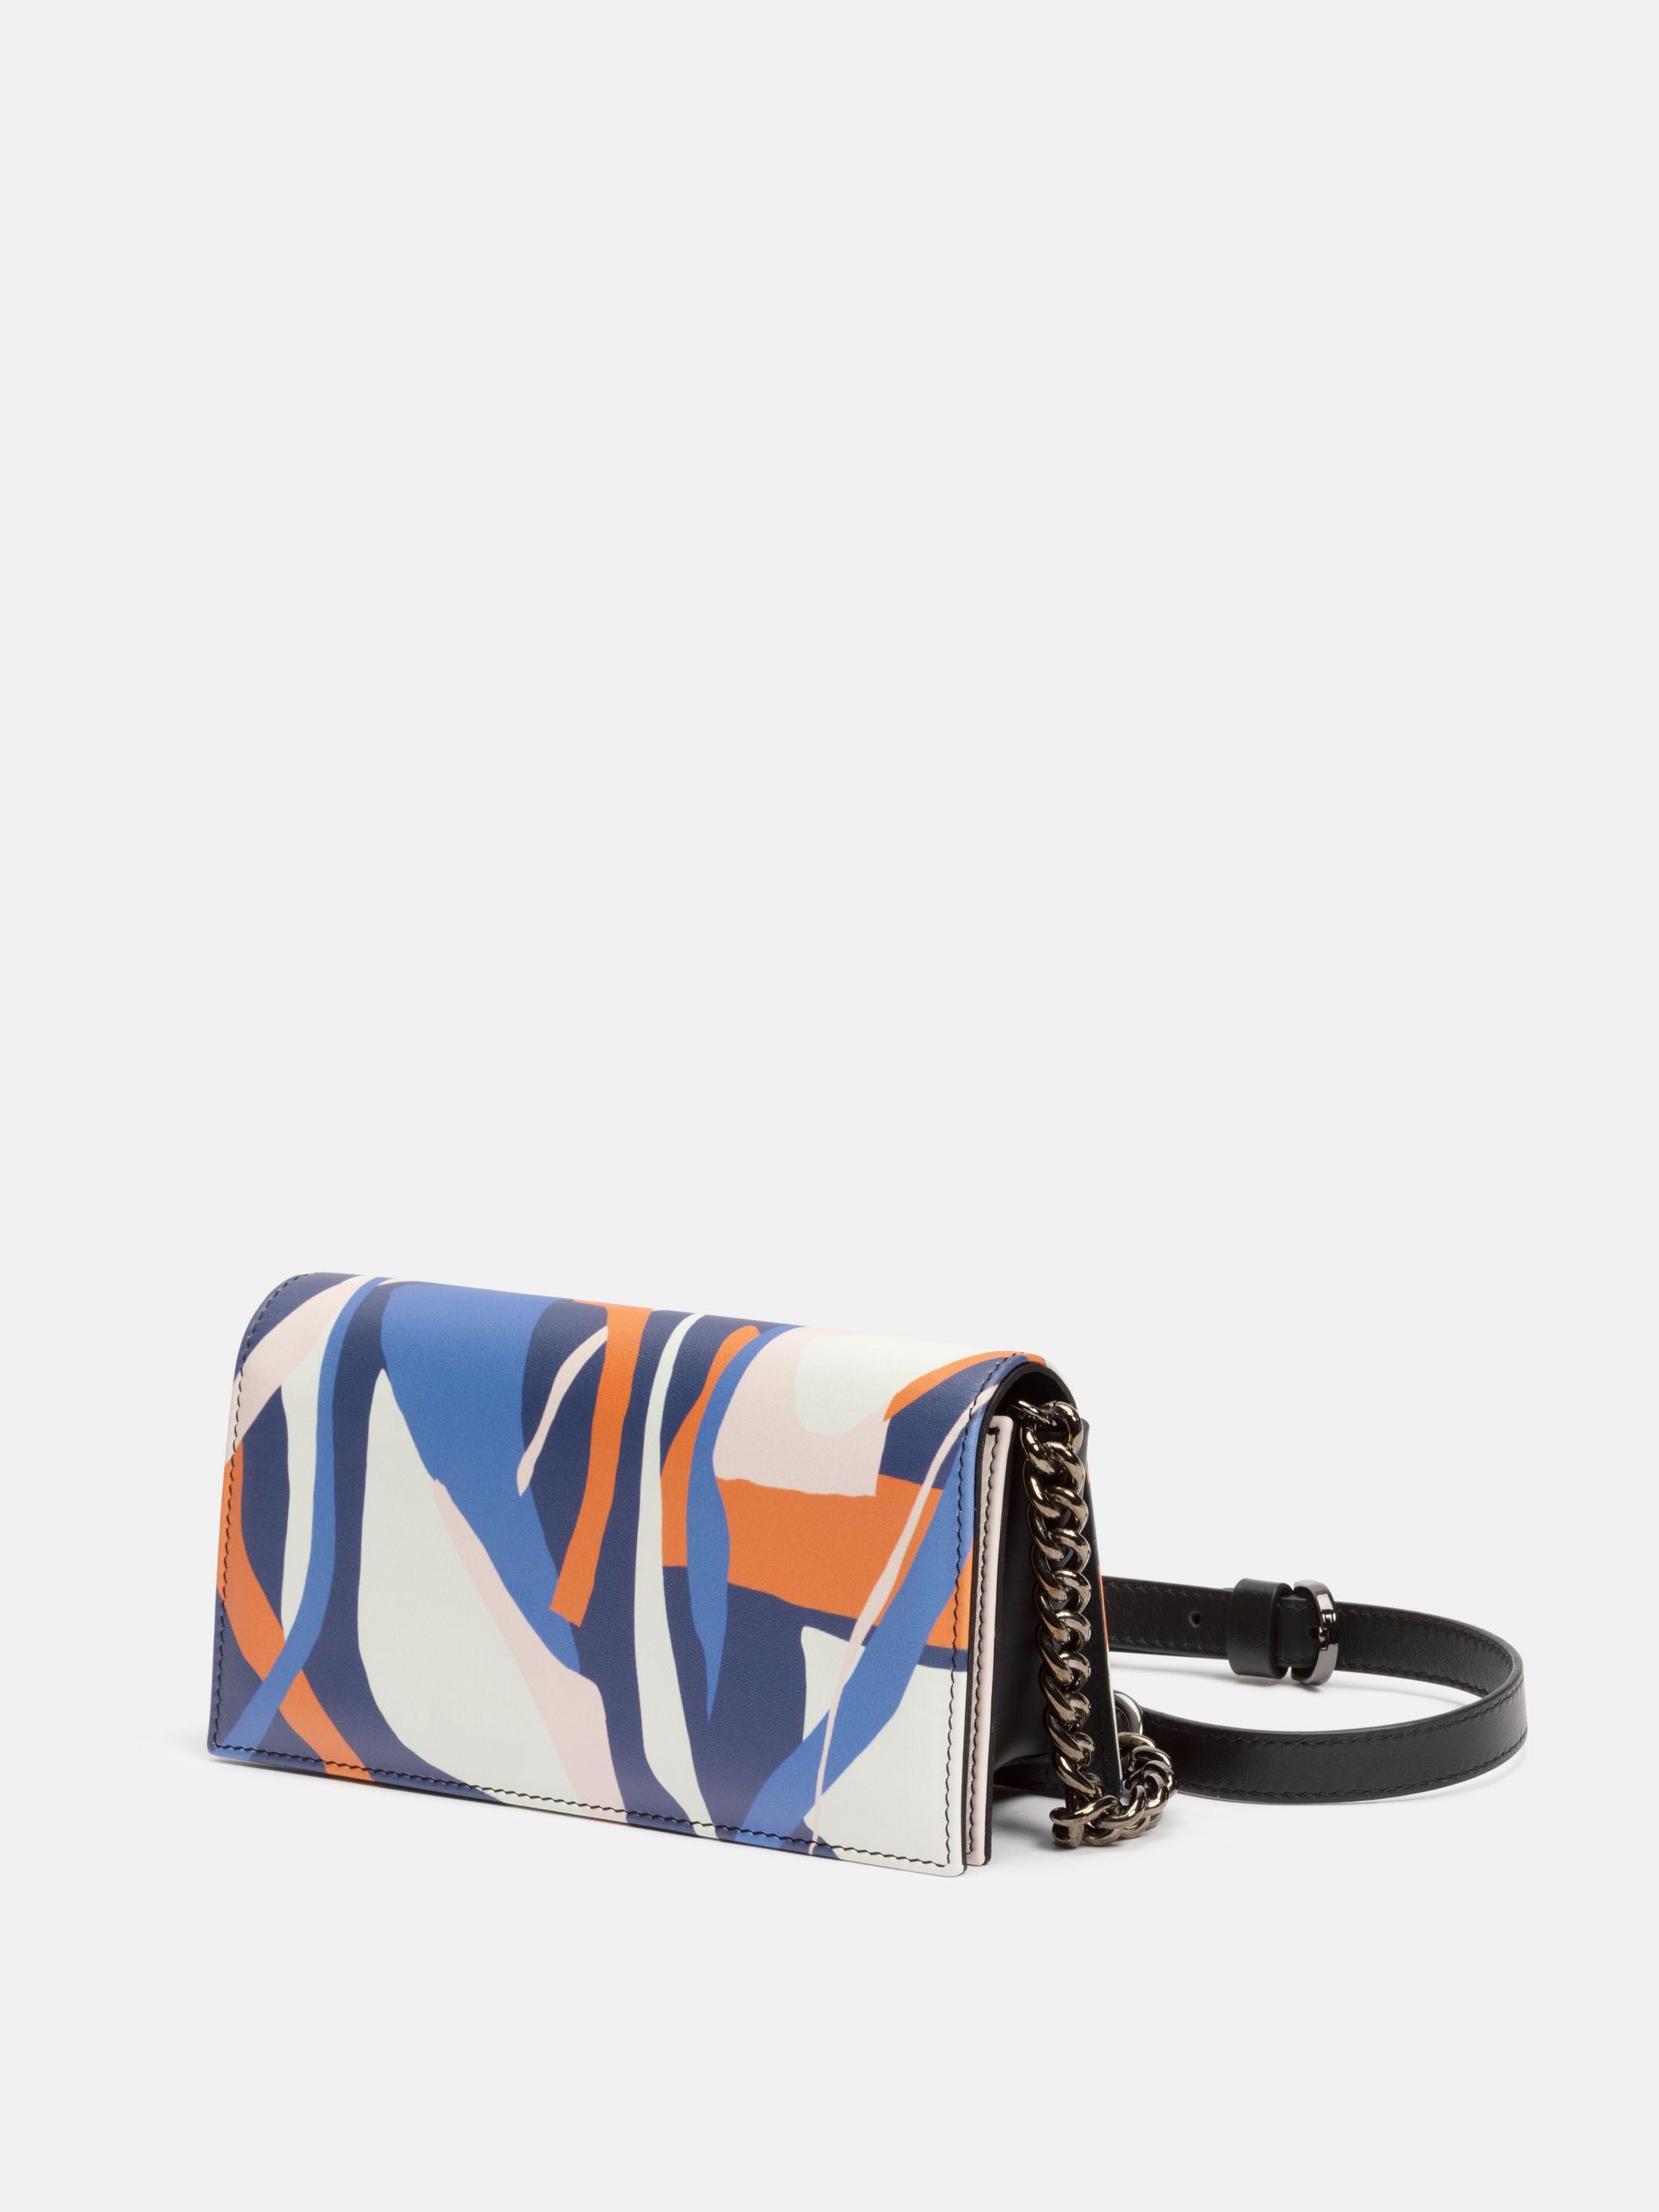 Custom evening bag